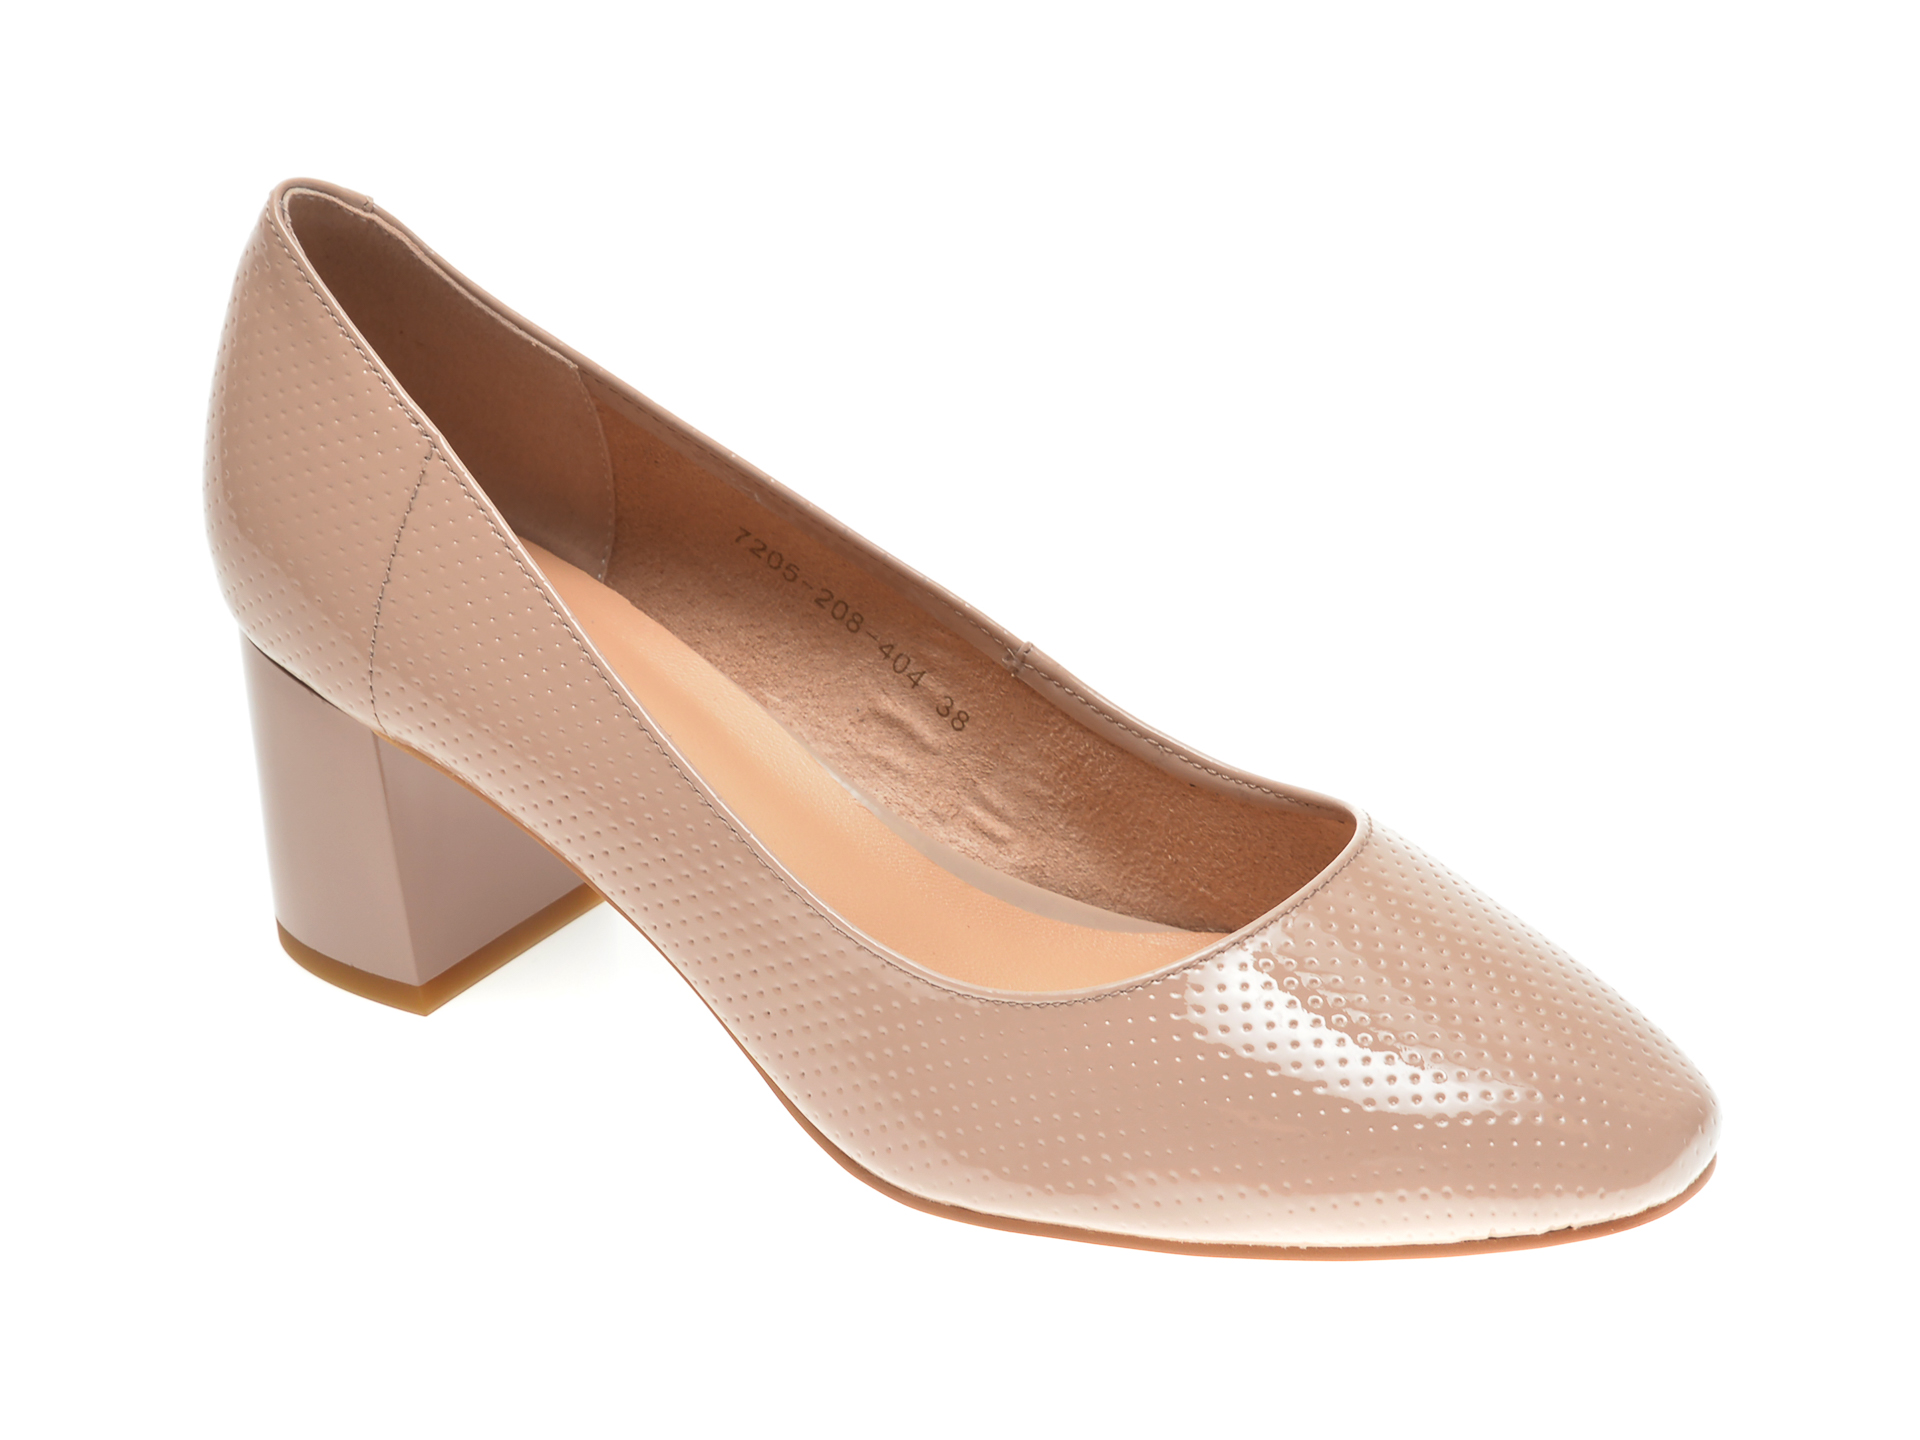 Pantofi EPICA bej, 7205208, din piele naturala lacuita New